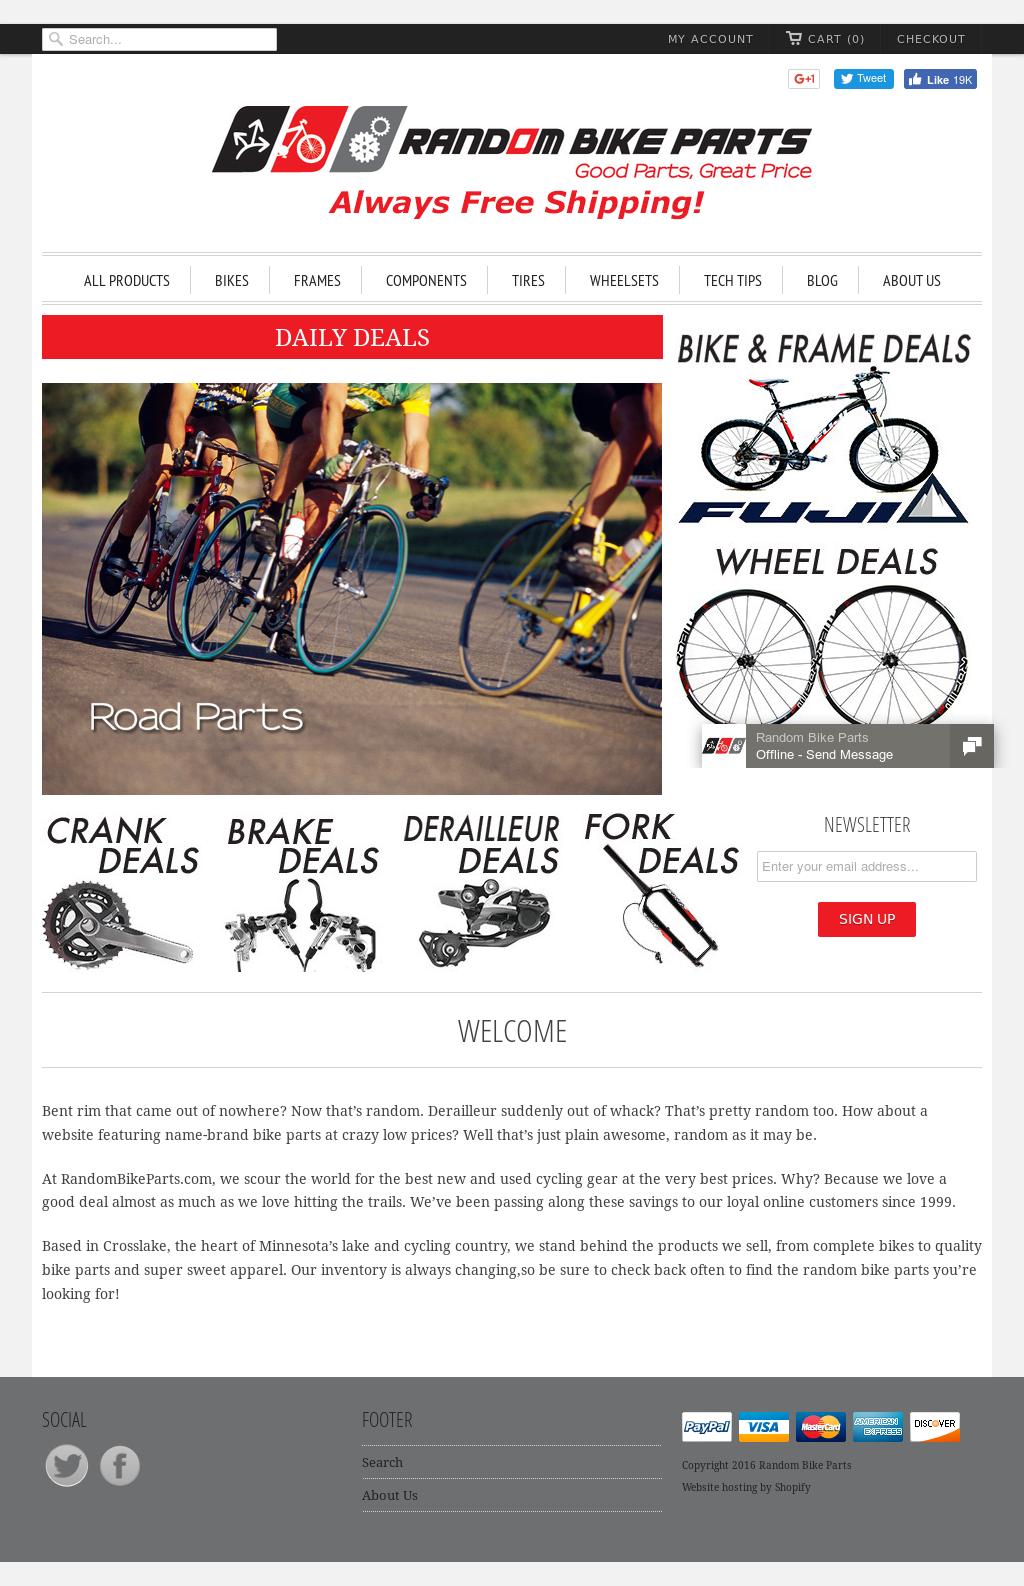 Random Bike Parts Competitors, Revenue and Employees - Owler